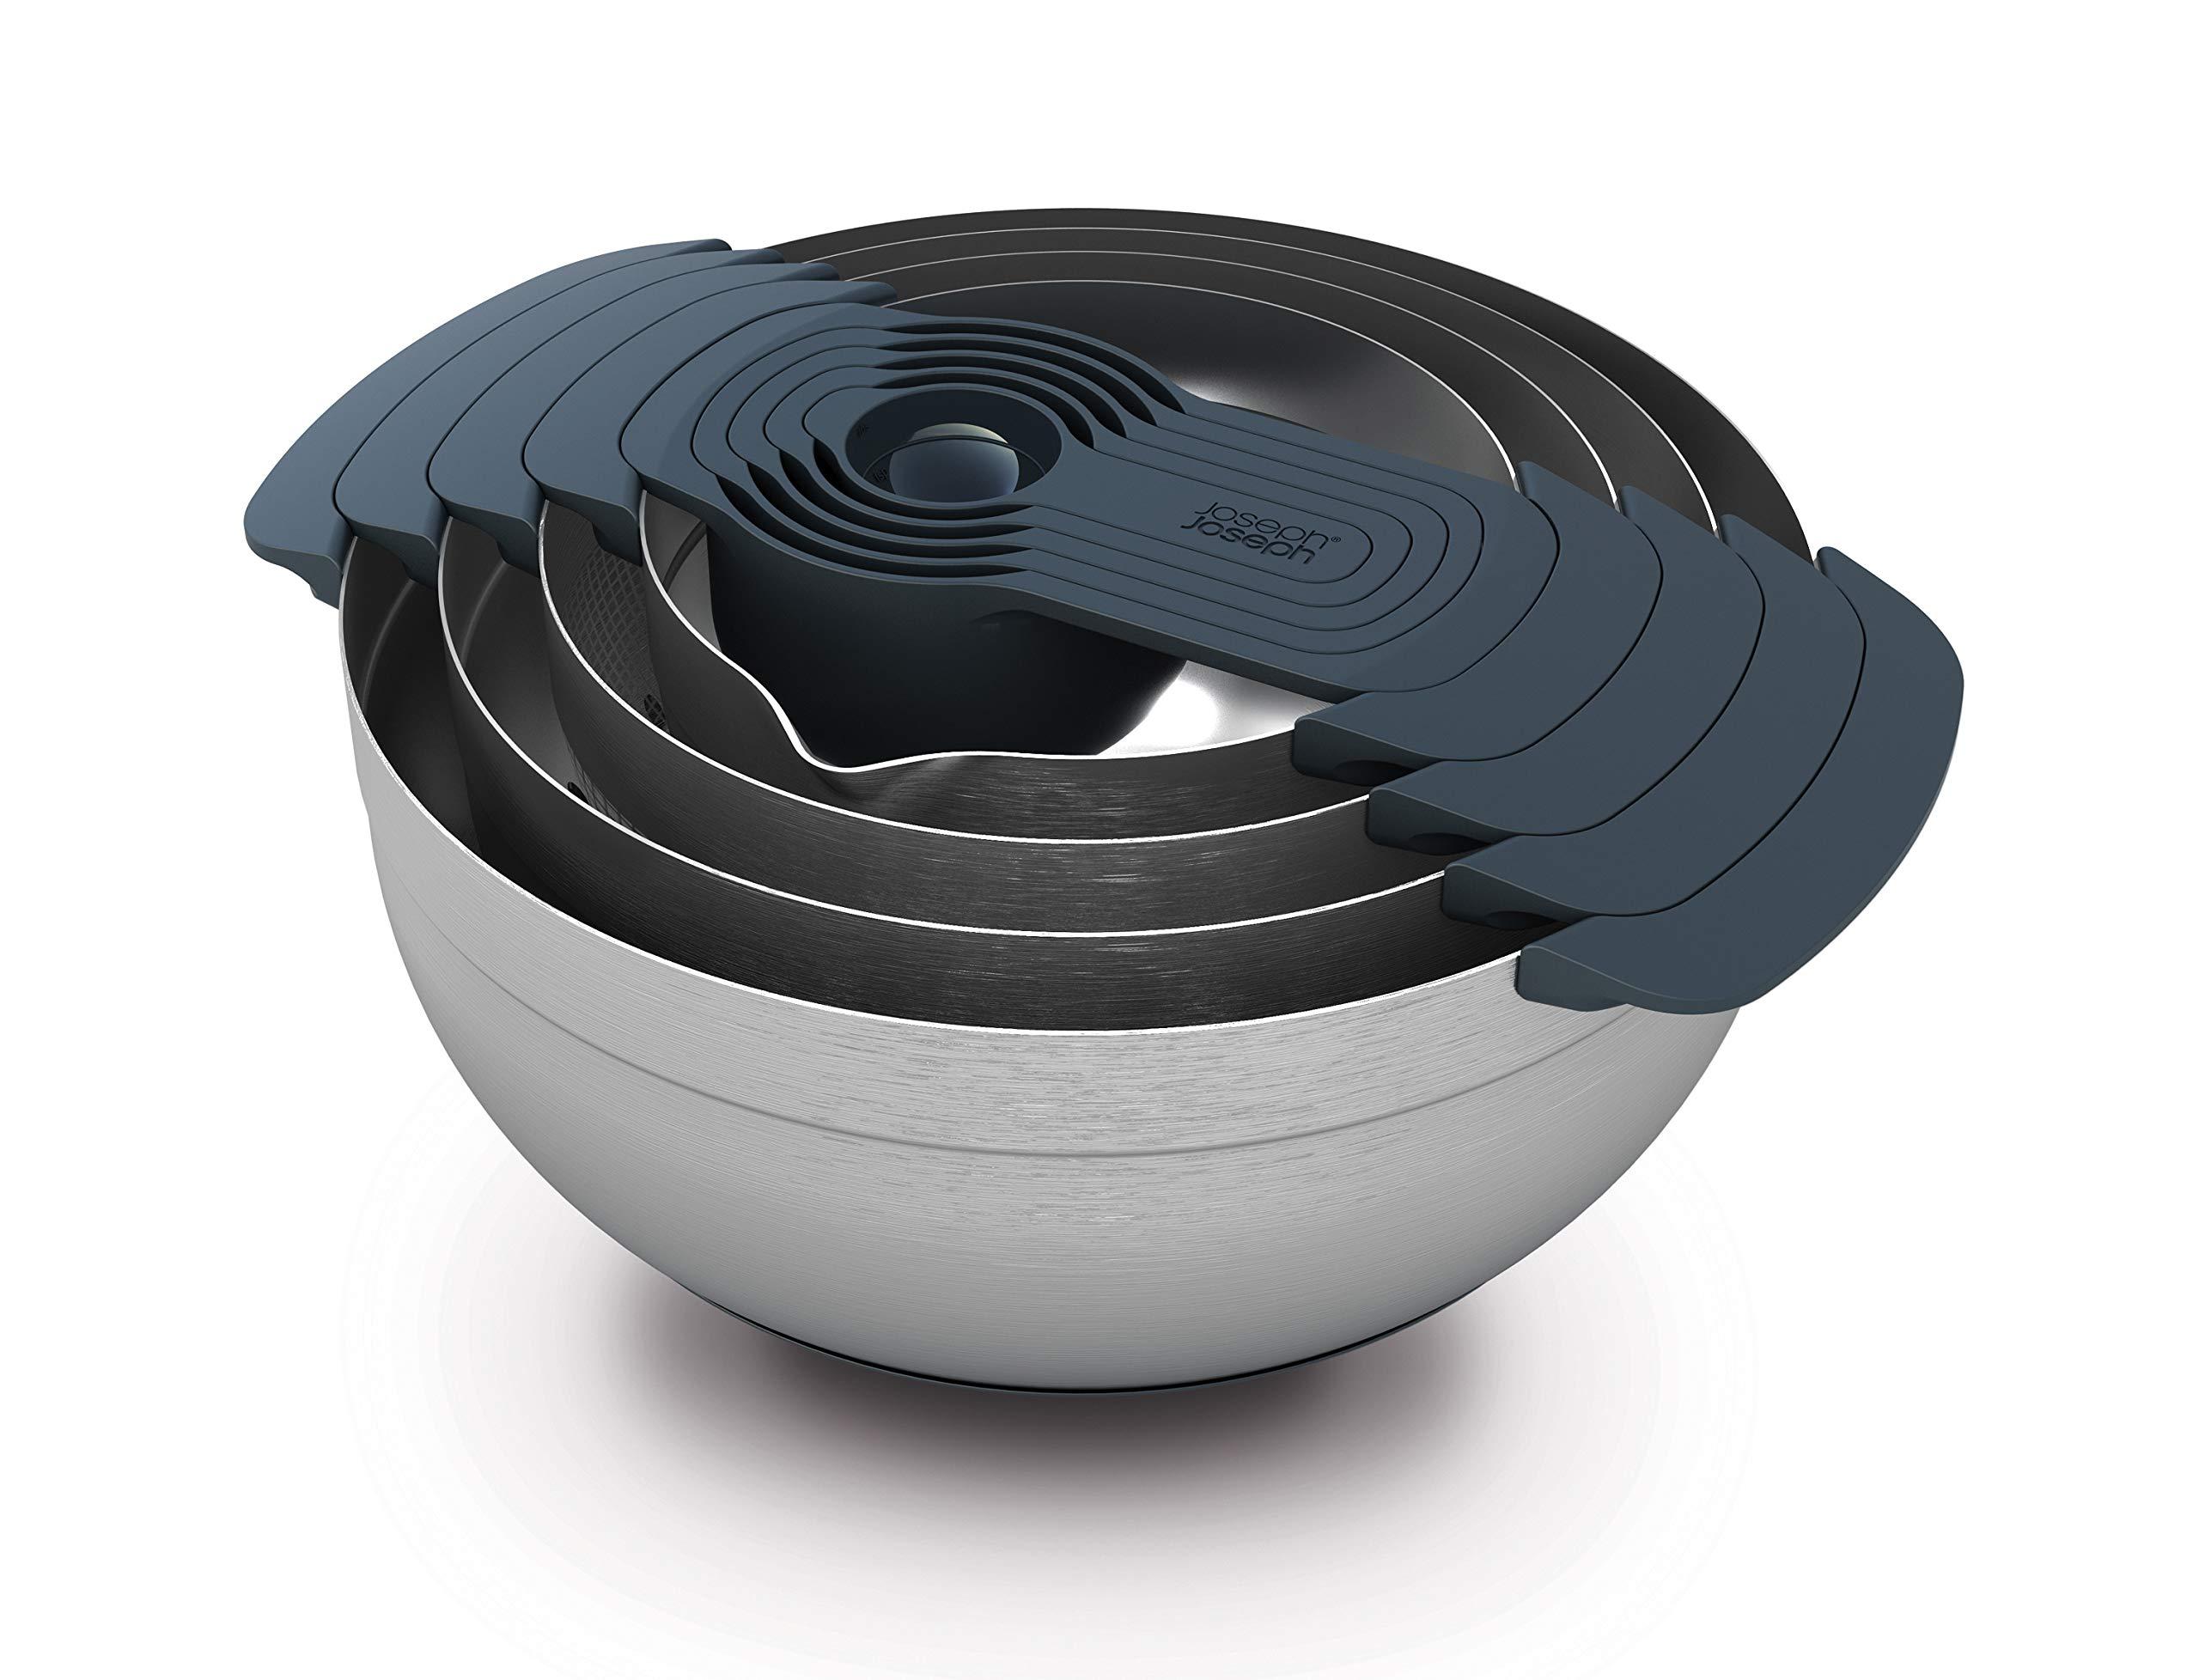 Joseph Joseph 9 Stainless Steel Compact Nesting Mixing Bowl Set Measuring Tools Sieve Colander Food Prep Dishwasher Safe Non-Slip, 9-Piece, Silver by Joseph Joseph